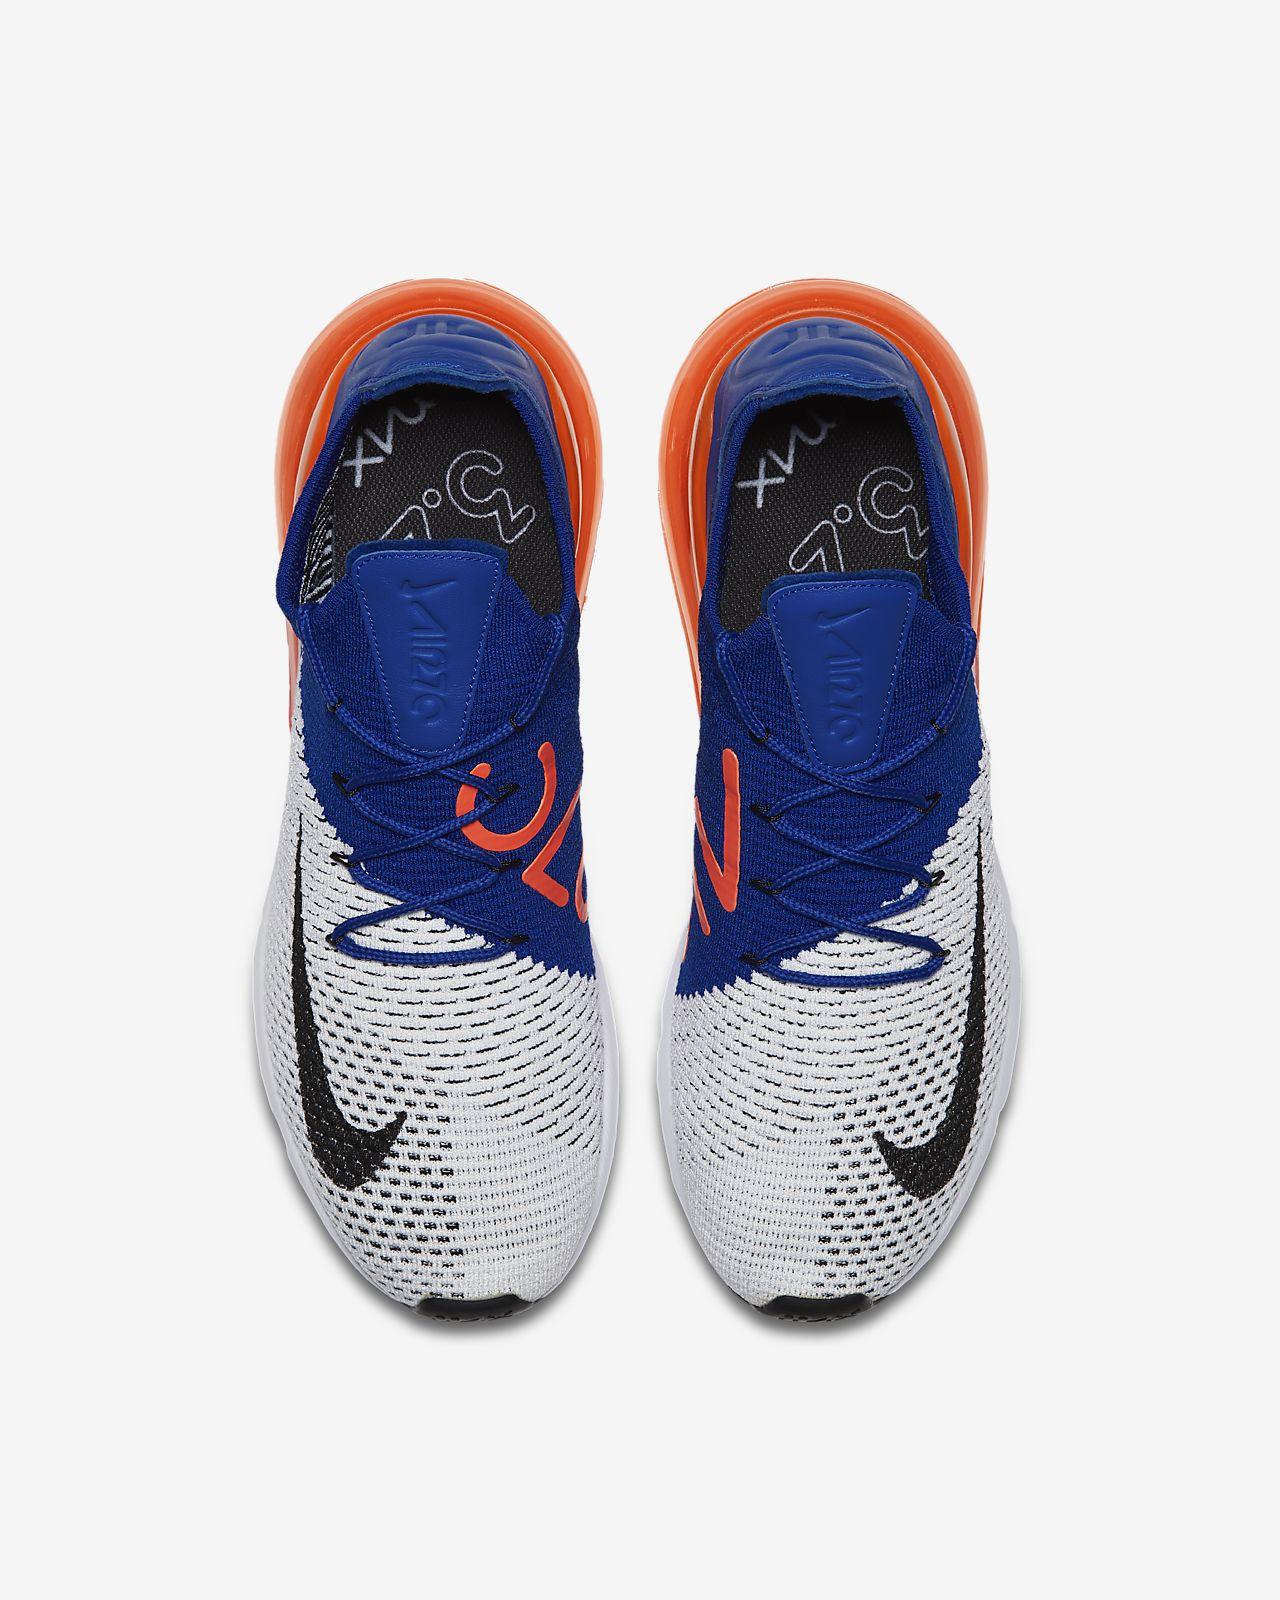 Mens WhiteRacer BlueTotal CrimsonBlack Nike Air Max 270